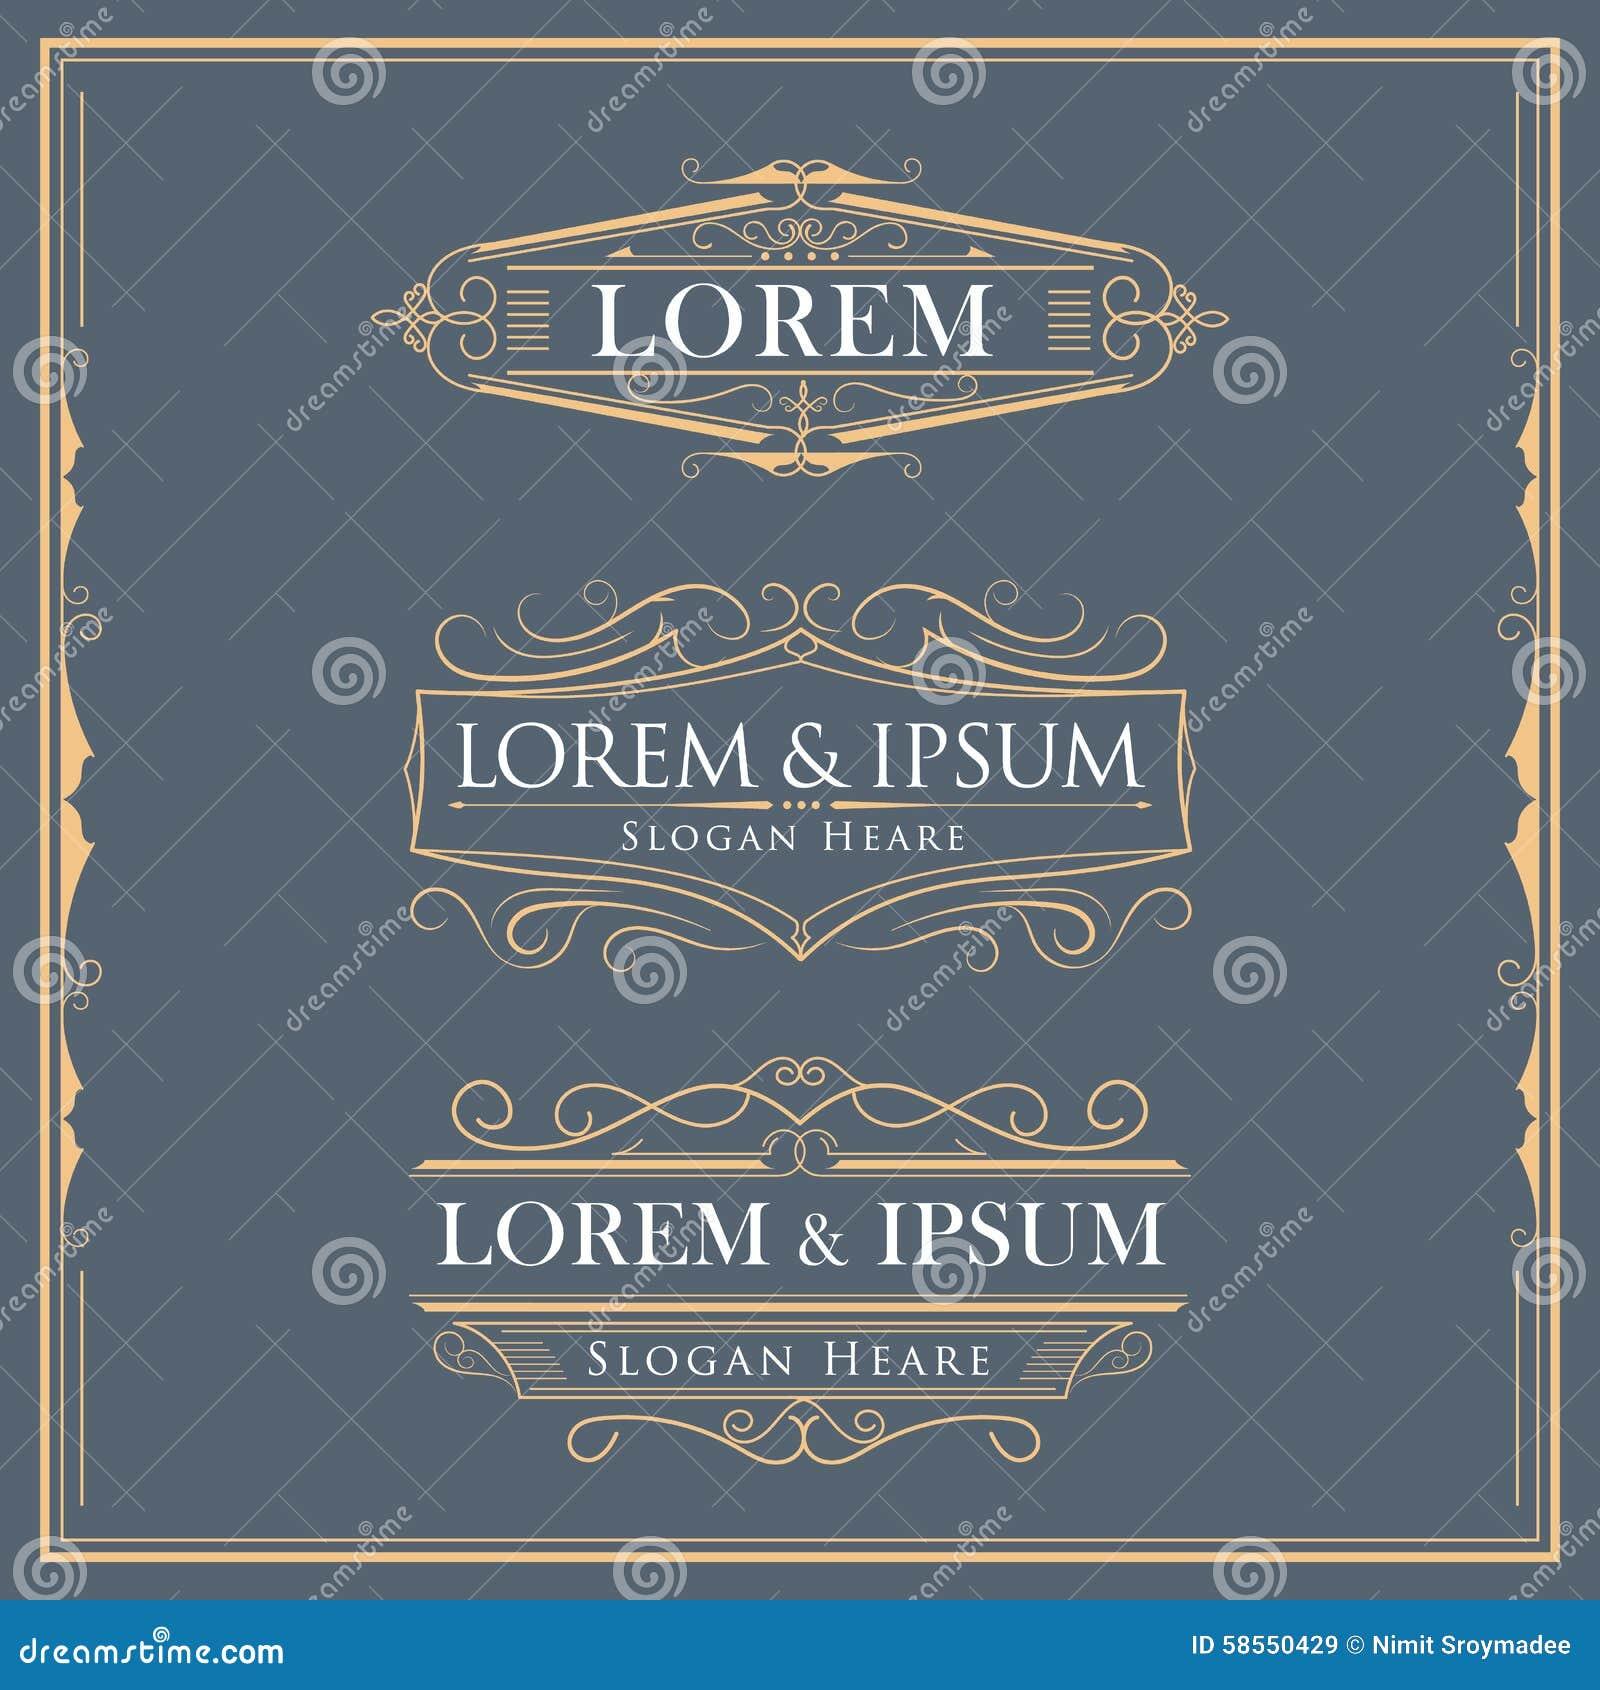 Luxury logos flourishes calligraphy elegant template